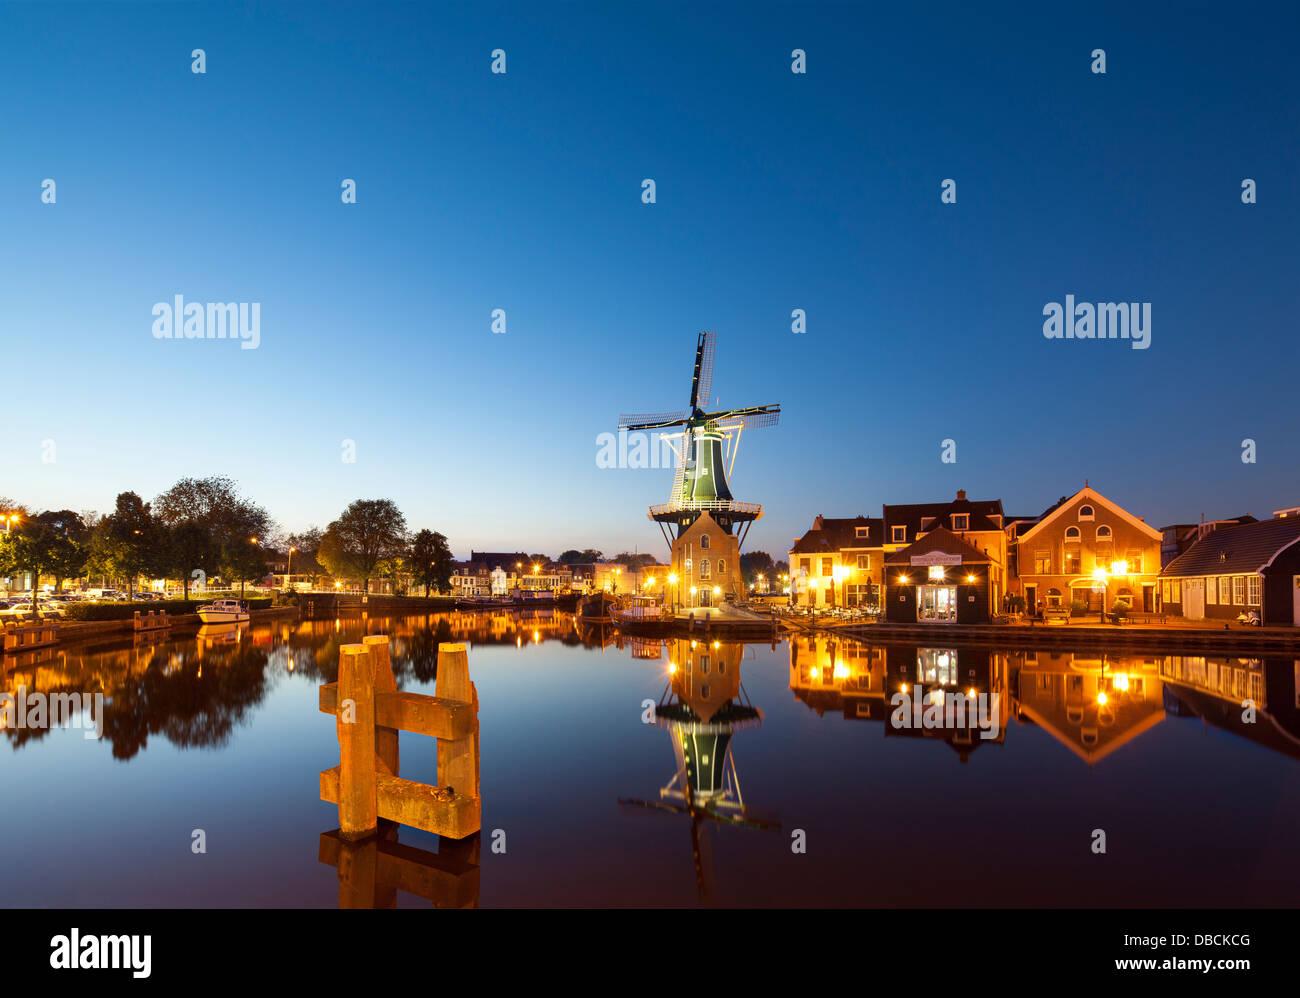 Landmark_windmill_De_Adriaan_in_Haarlem_